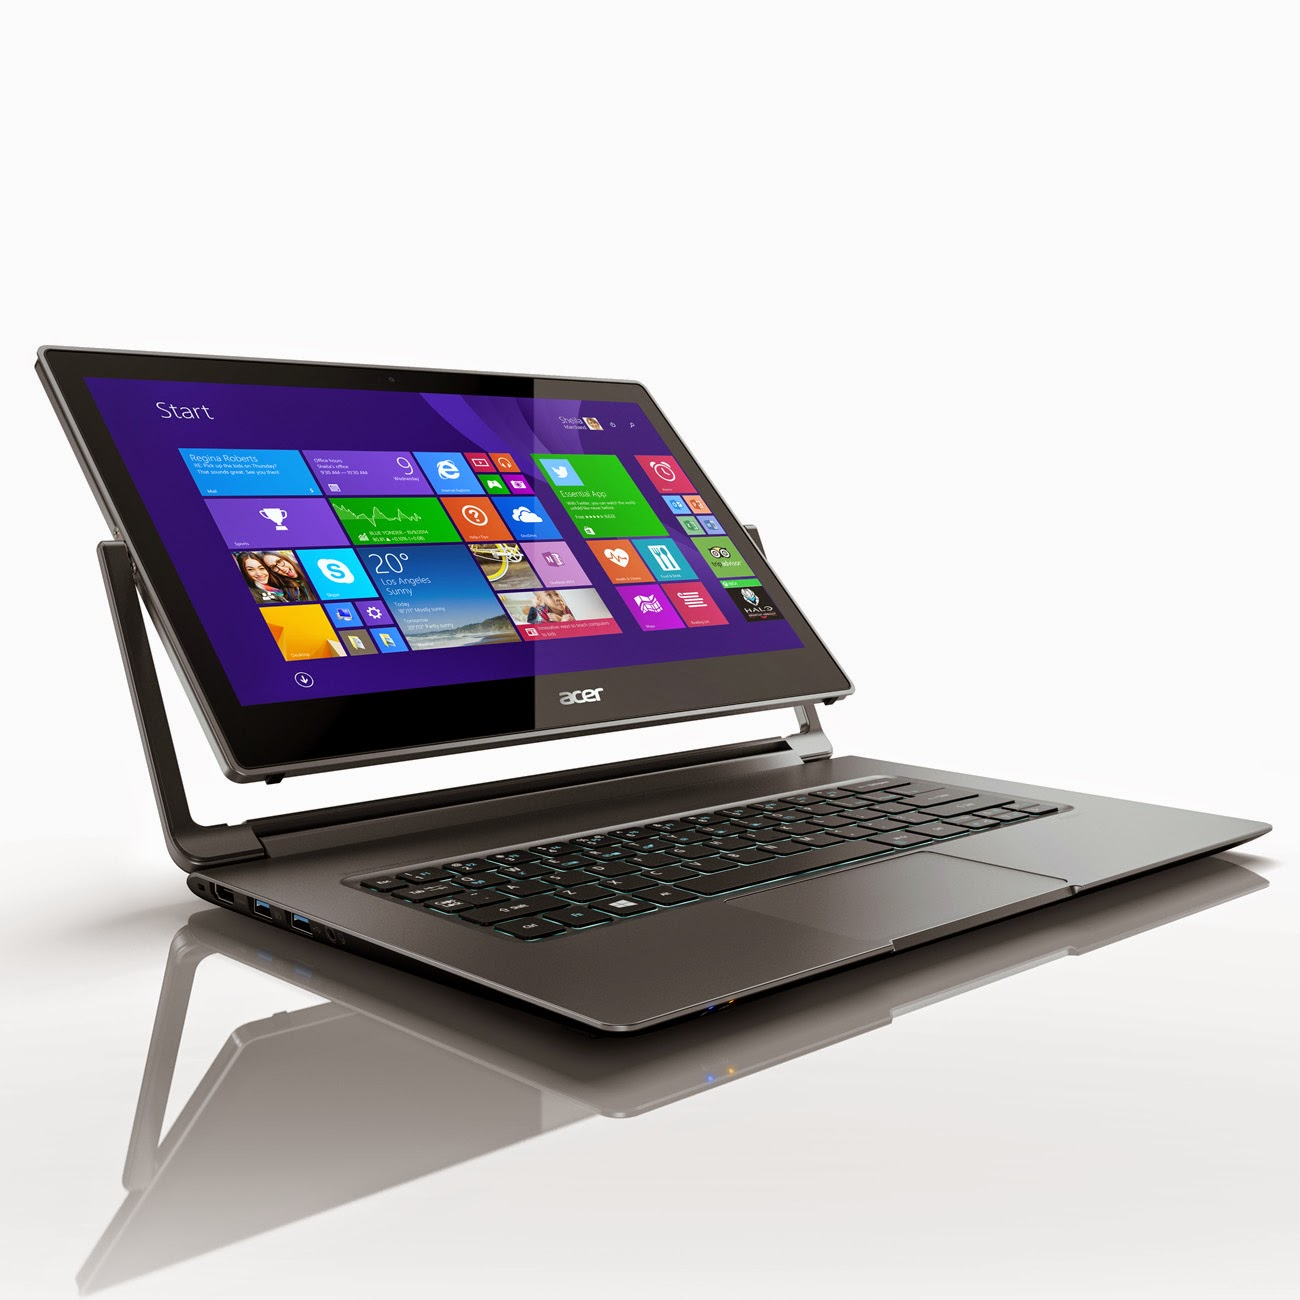 Laptop Driver Acer Aspire ANWMI Drivers Windows XP/Vista/7